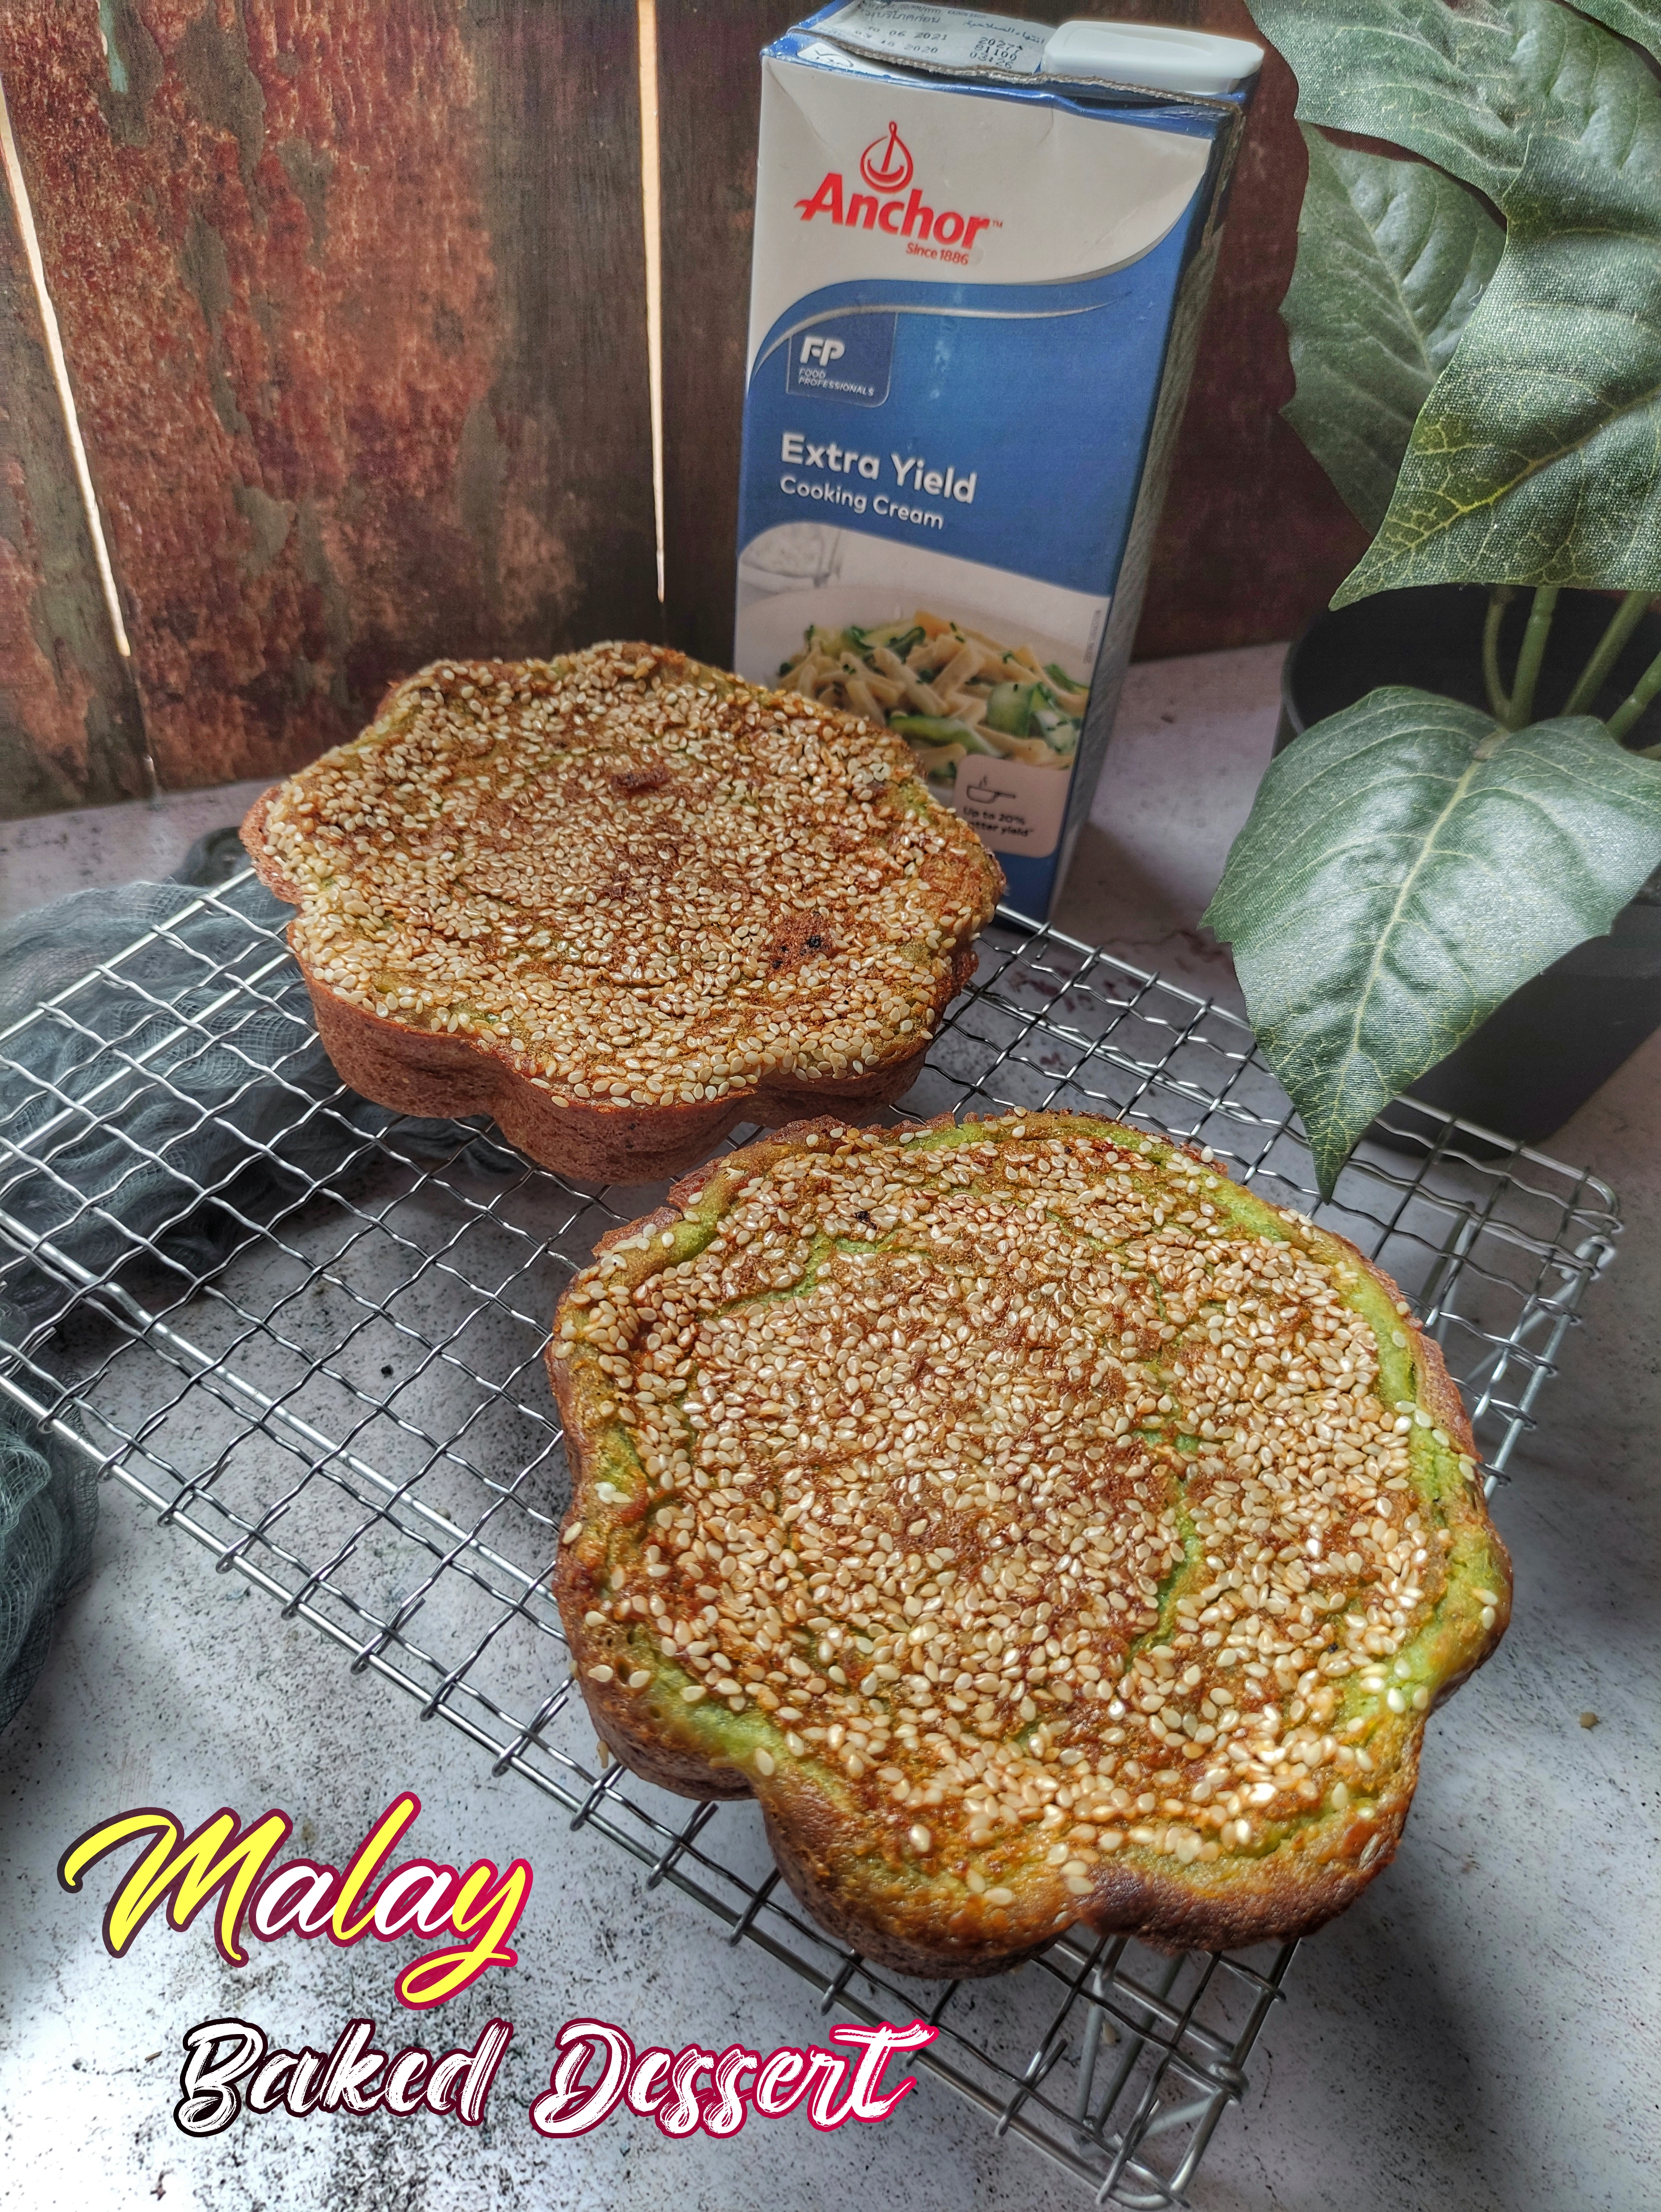 Malay Baked Dessert